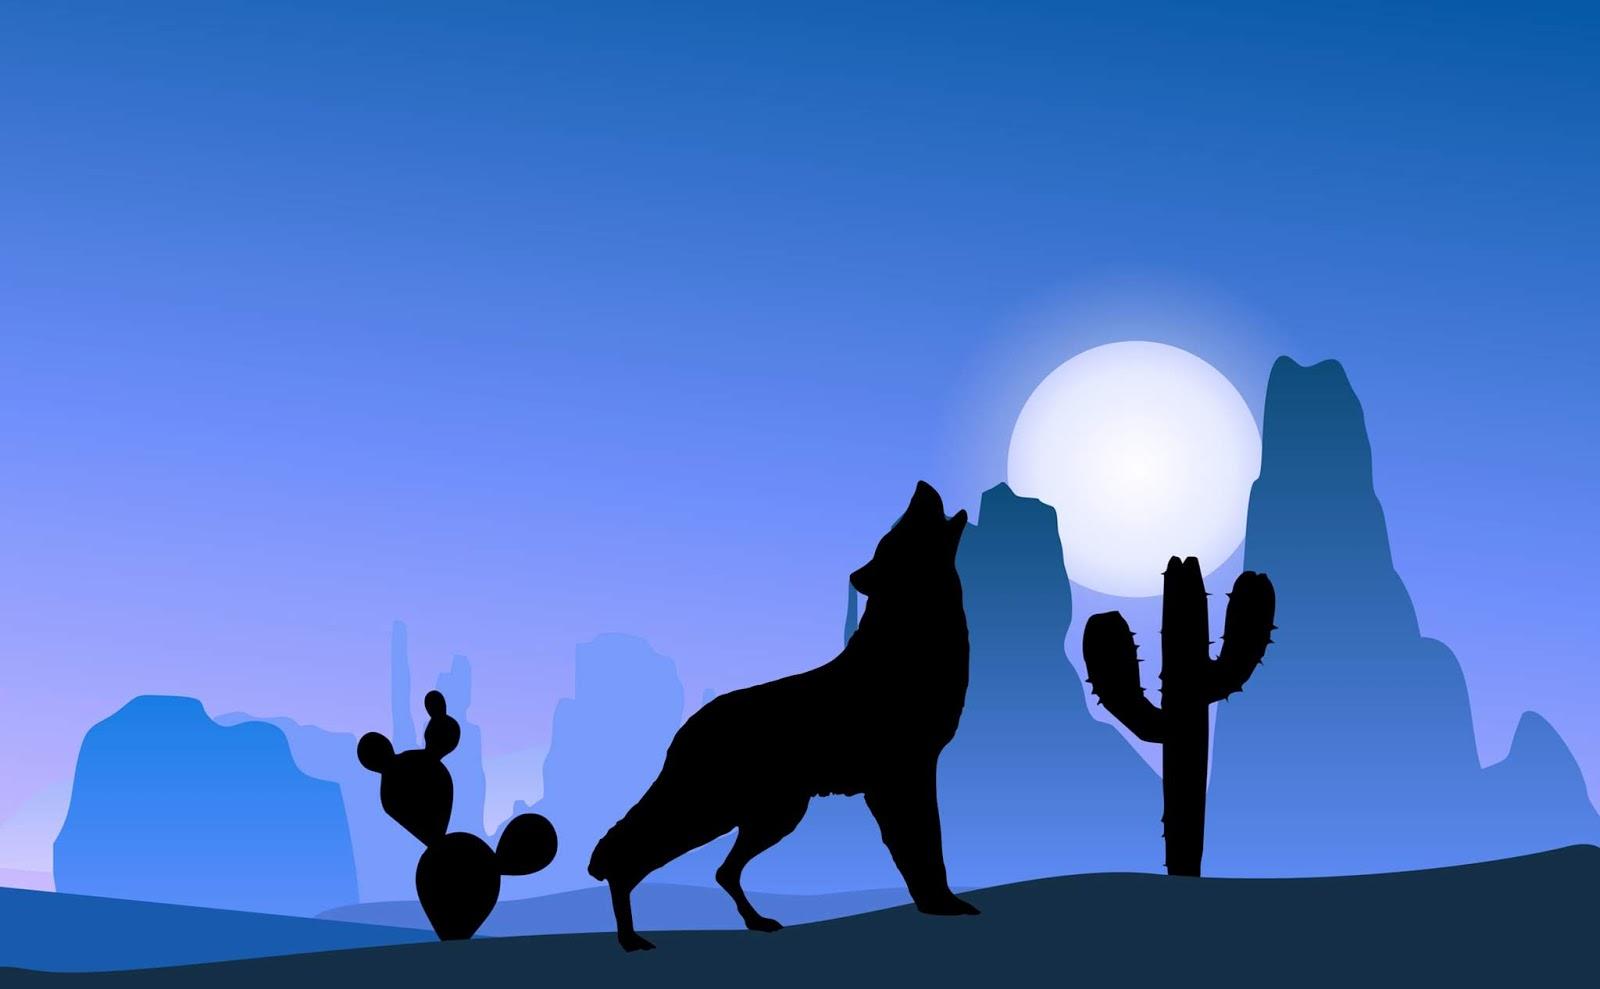 Illustration of wolf standing in moonlight